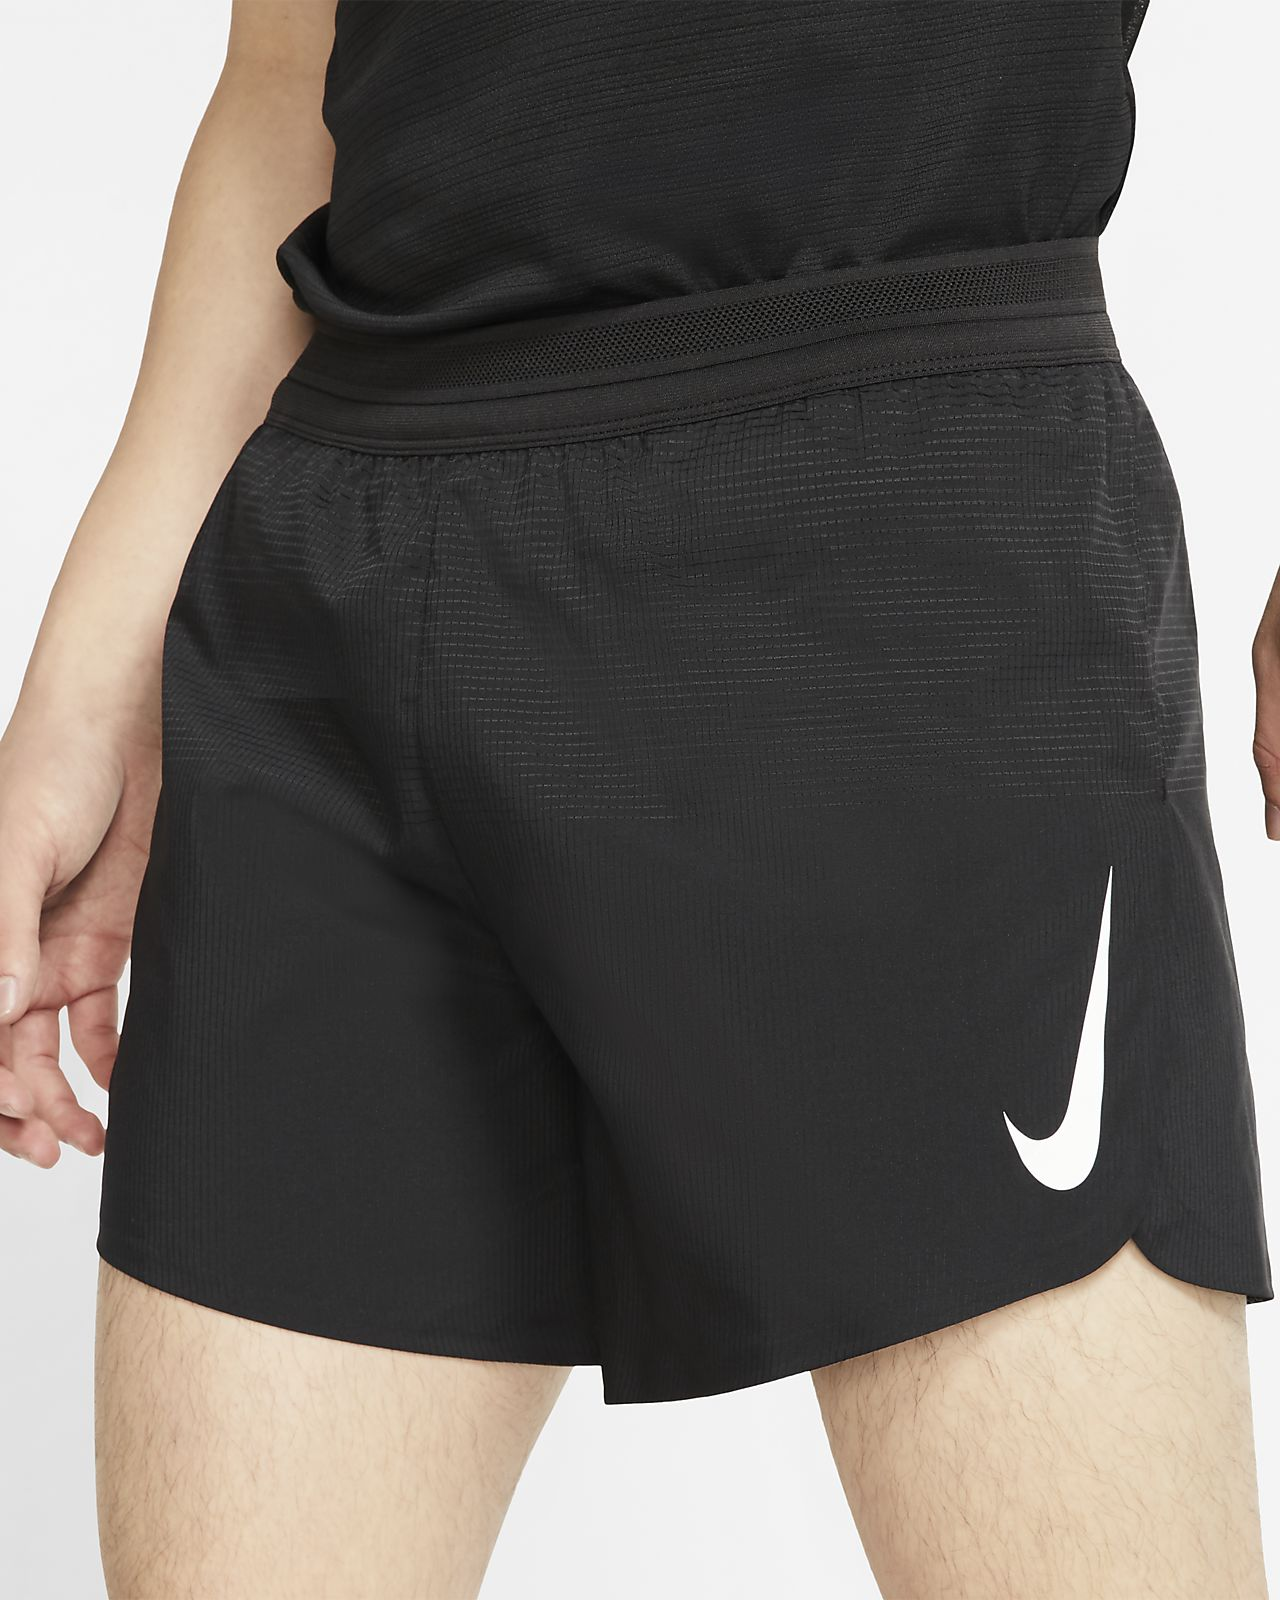 Short de running Nike AeroSwift (London) 13 cm pour Homme